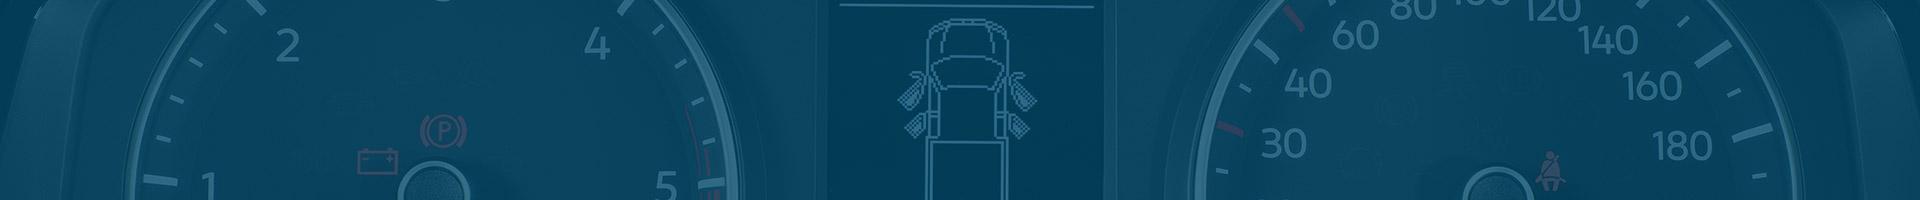 banner-best-drive-desktop